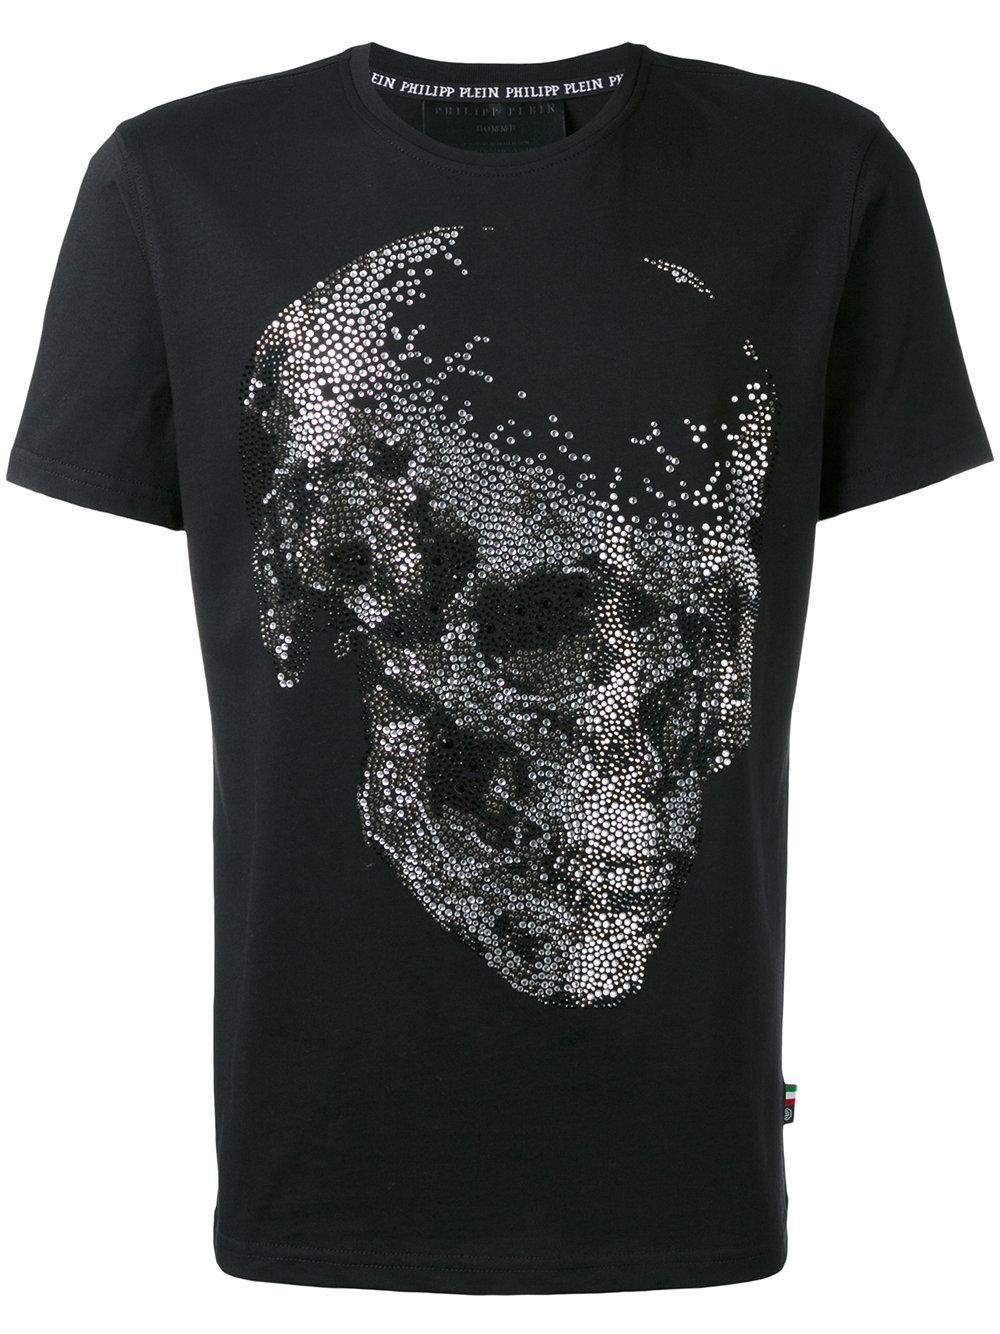 philipp plein kit t shirt in black for men lyst. Black Bedroom Furniture Sets. Home Design Ideas